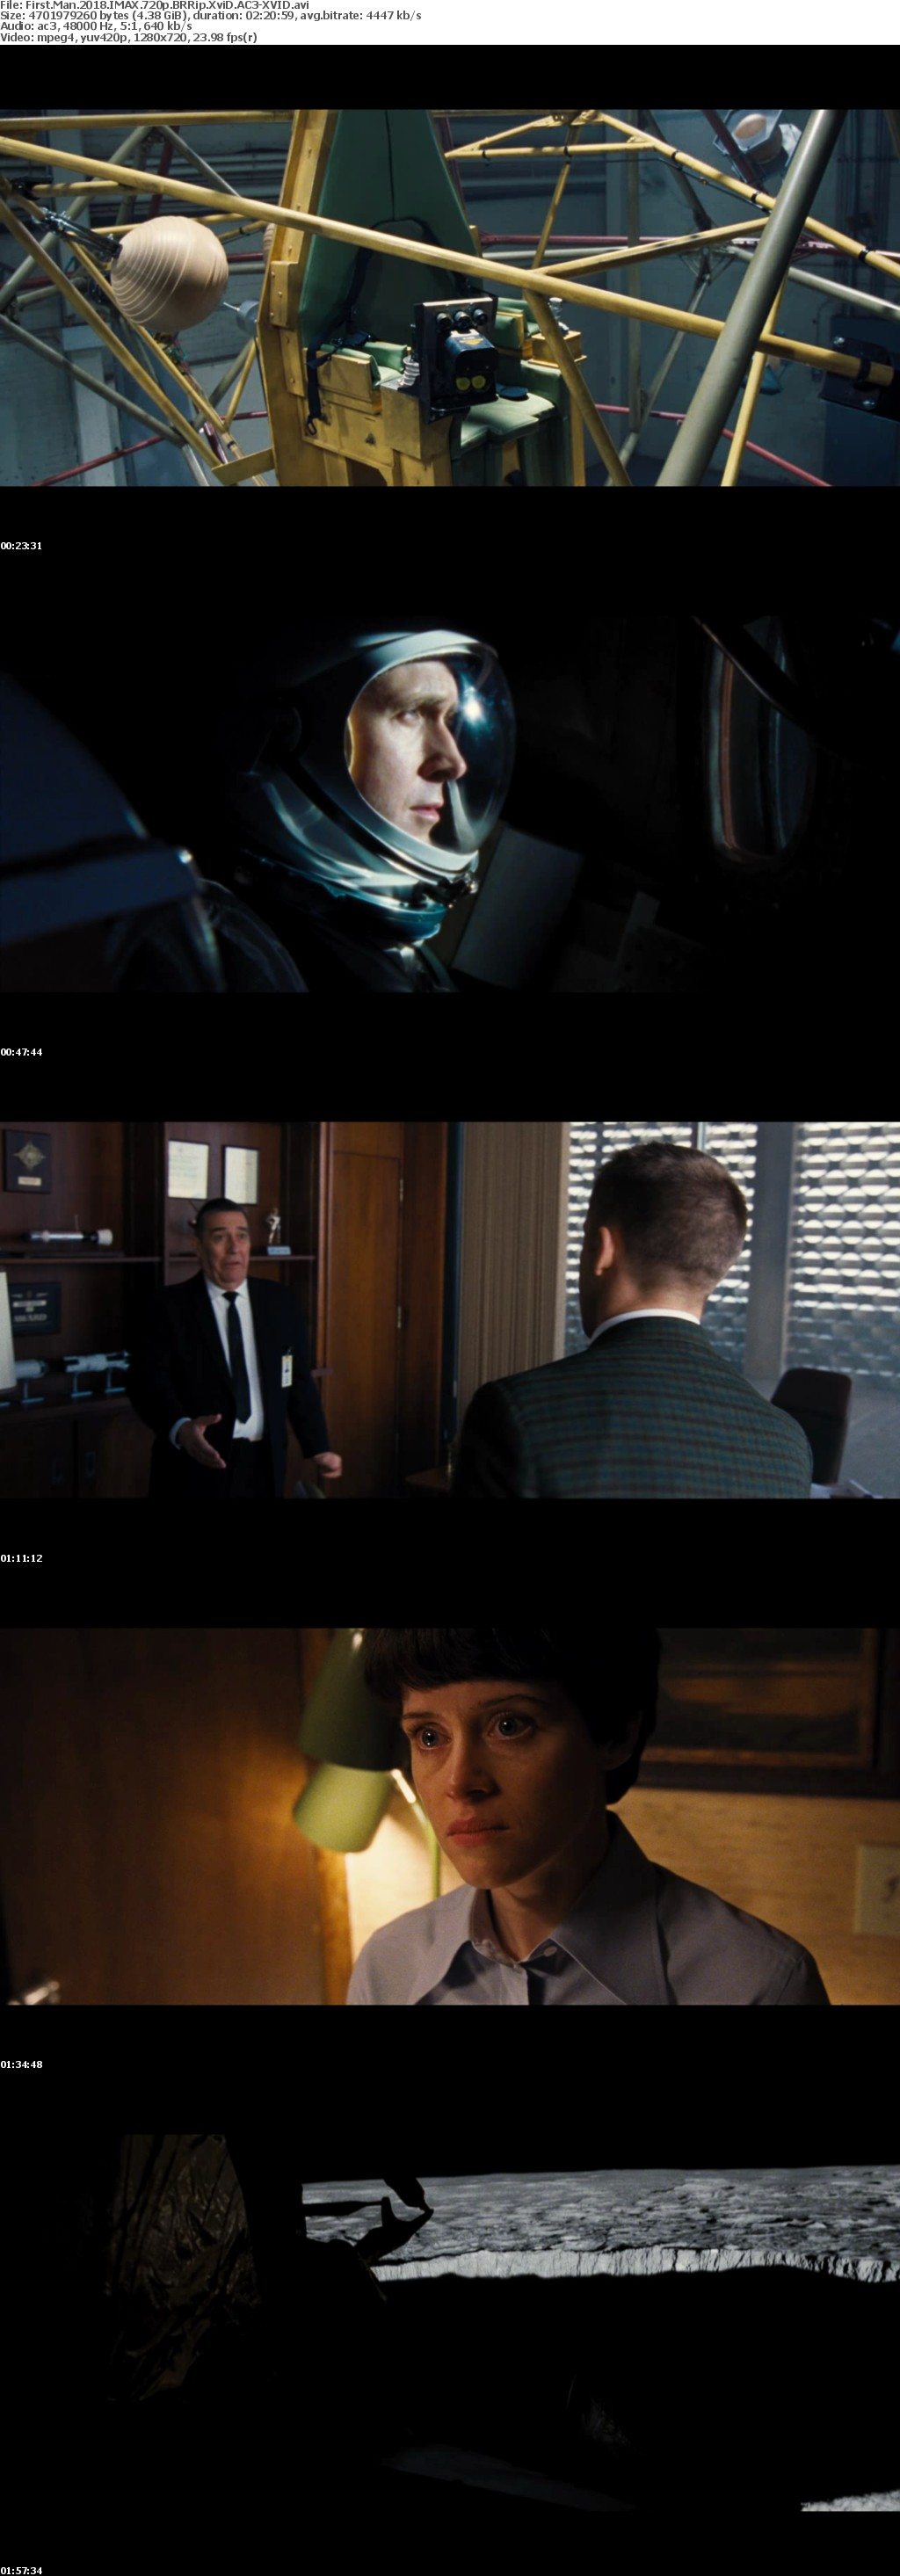 First Man 2018 IMAX 720p BRRip XviD AC3-XVID